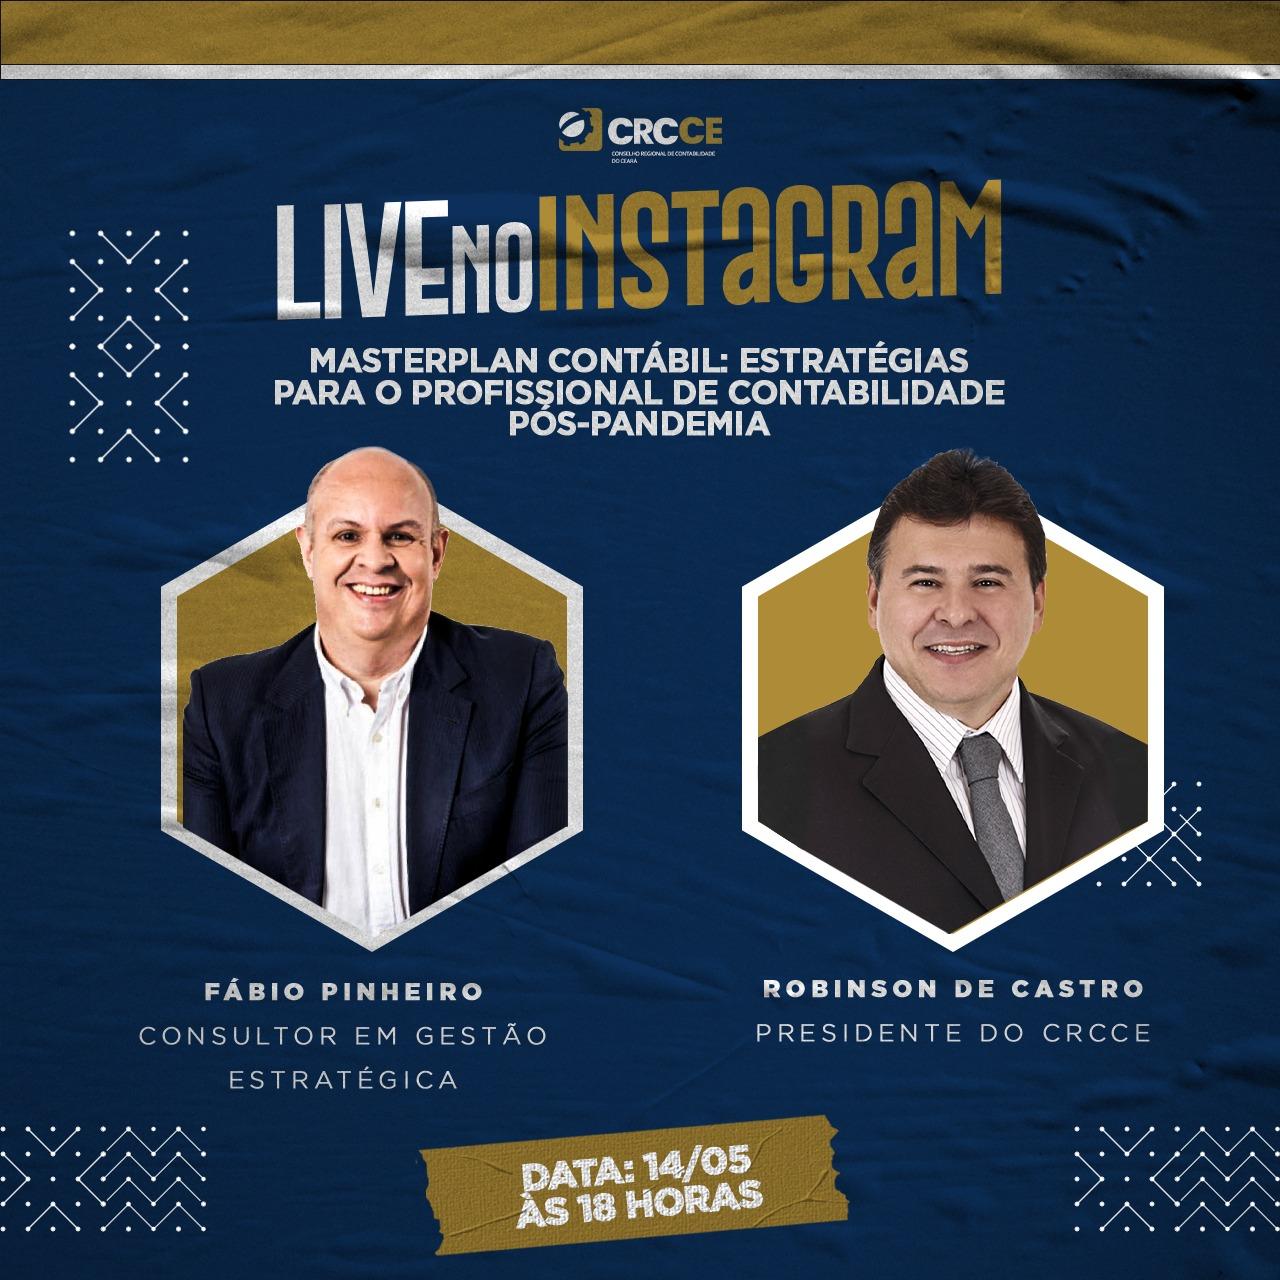 CRCCE apresenta projeto Master Plan Contábil duranteLive no Instagram